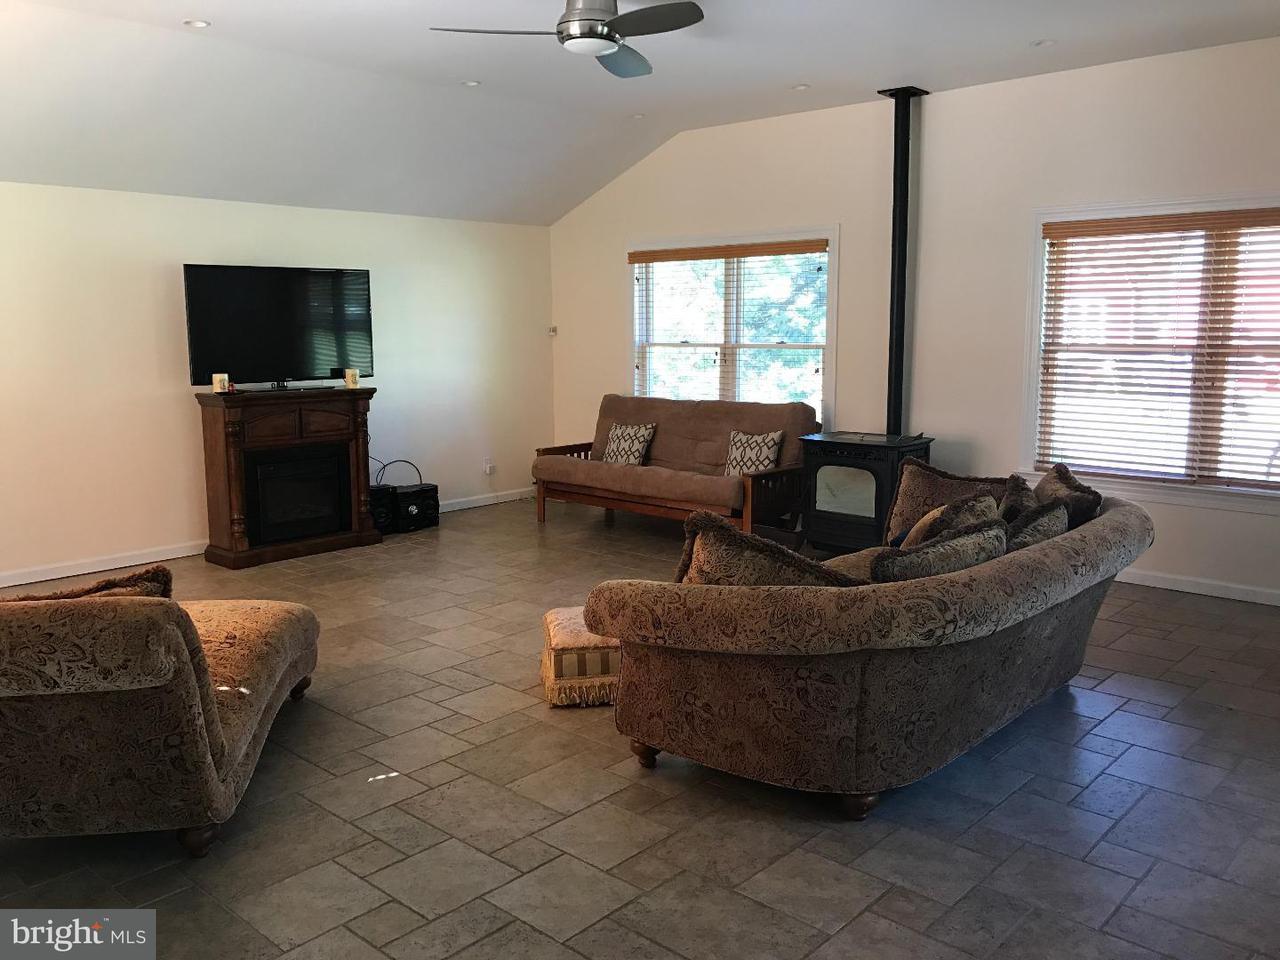 Single Family Home for Rent at 198 WINDING Lane Kennett Square, Pennsylvania 19348 United States